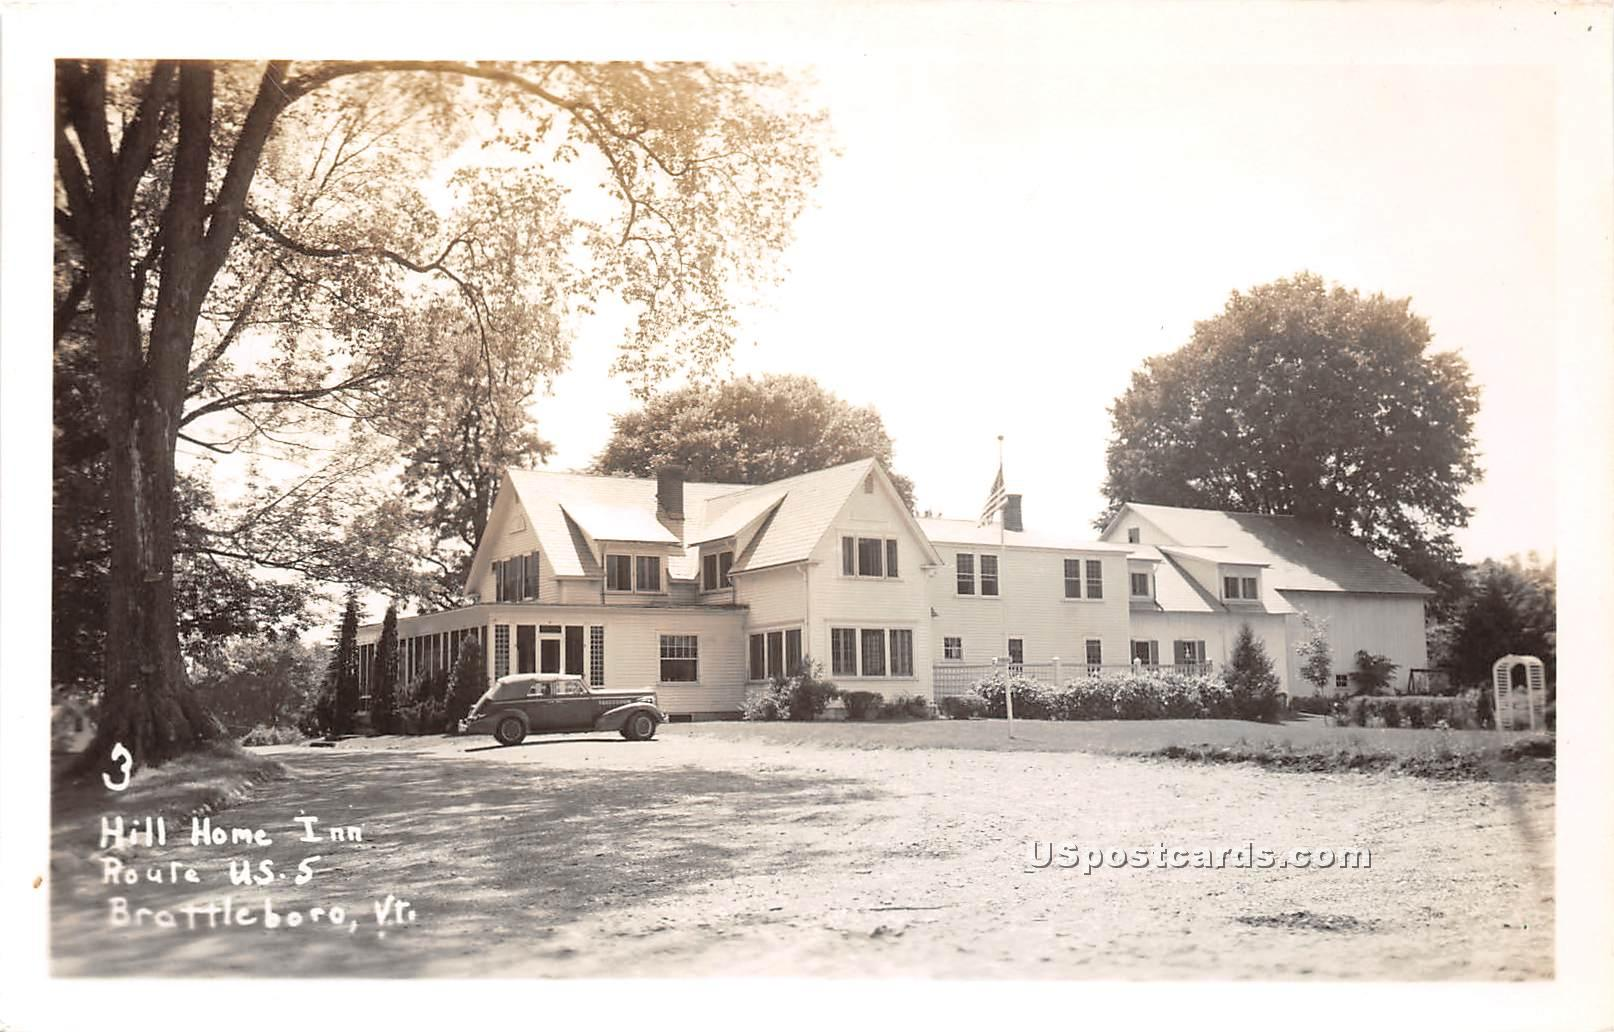 Hill Home Inn - Brattleboro, Vermont VT Postcard